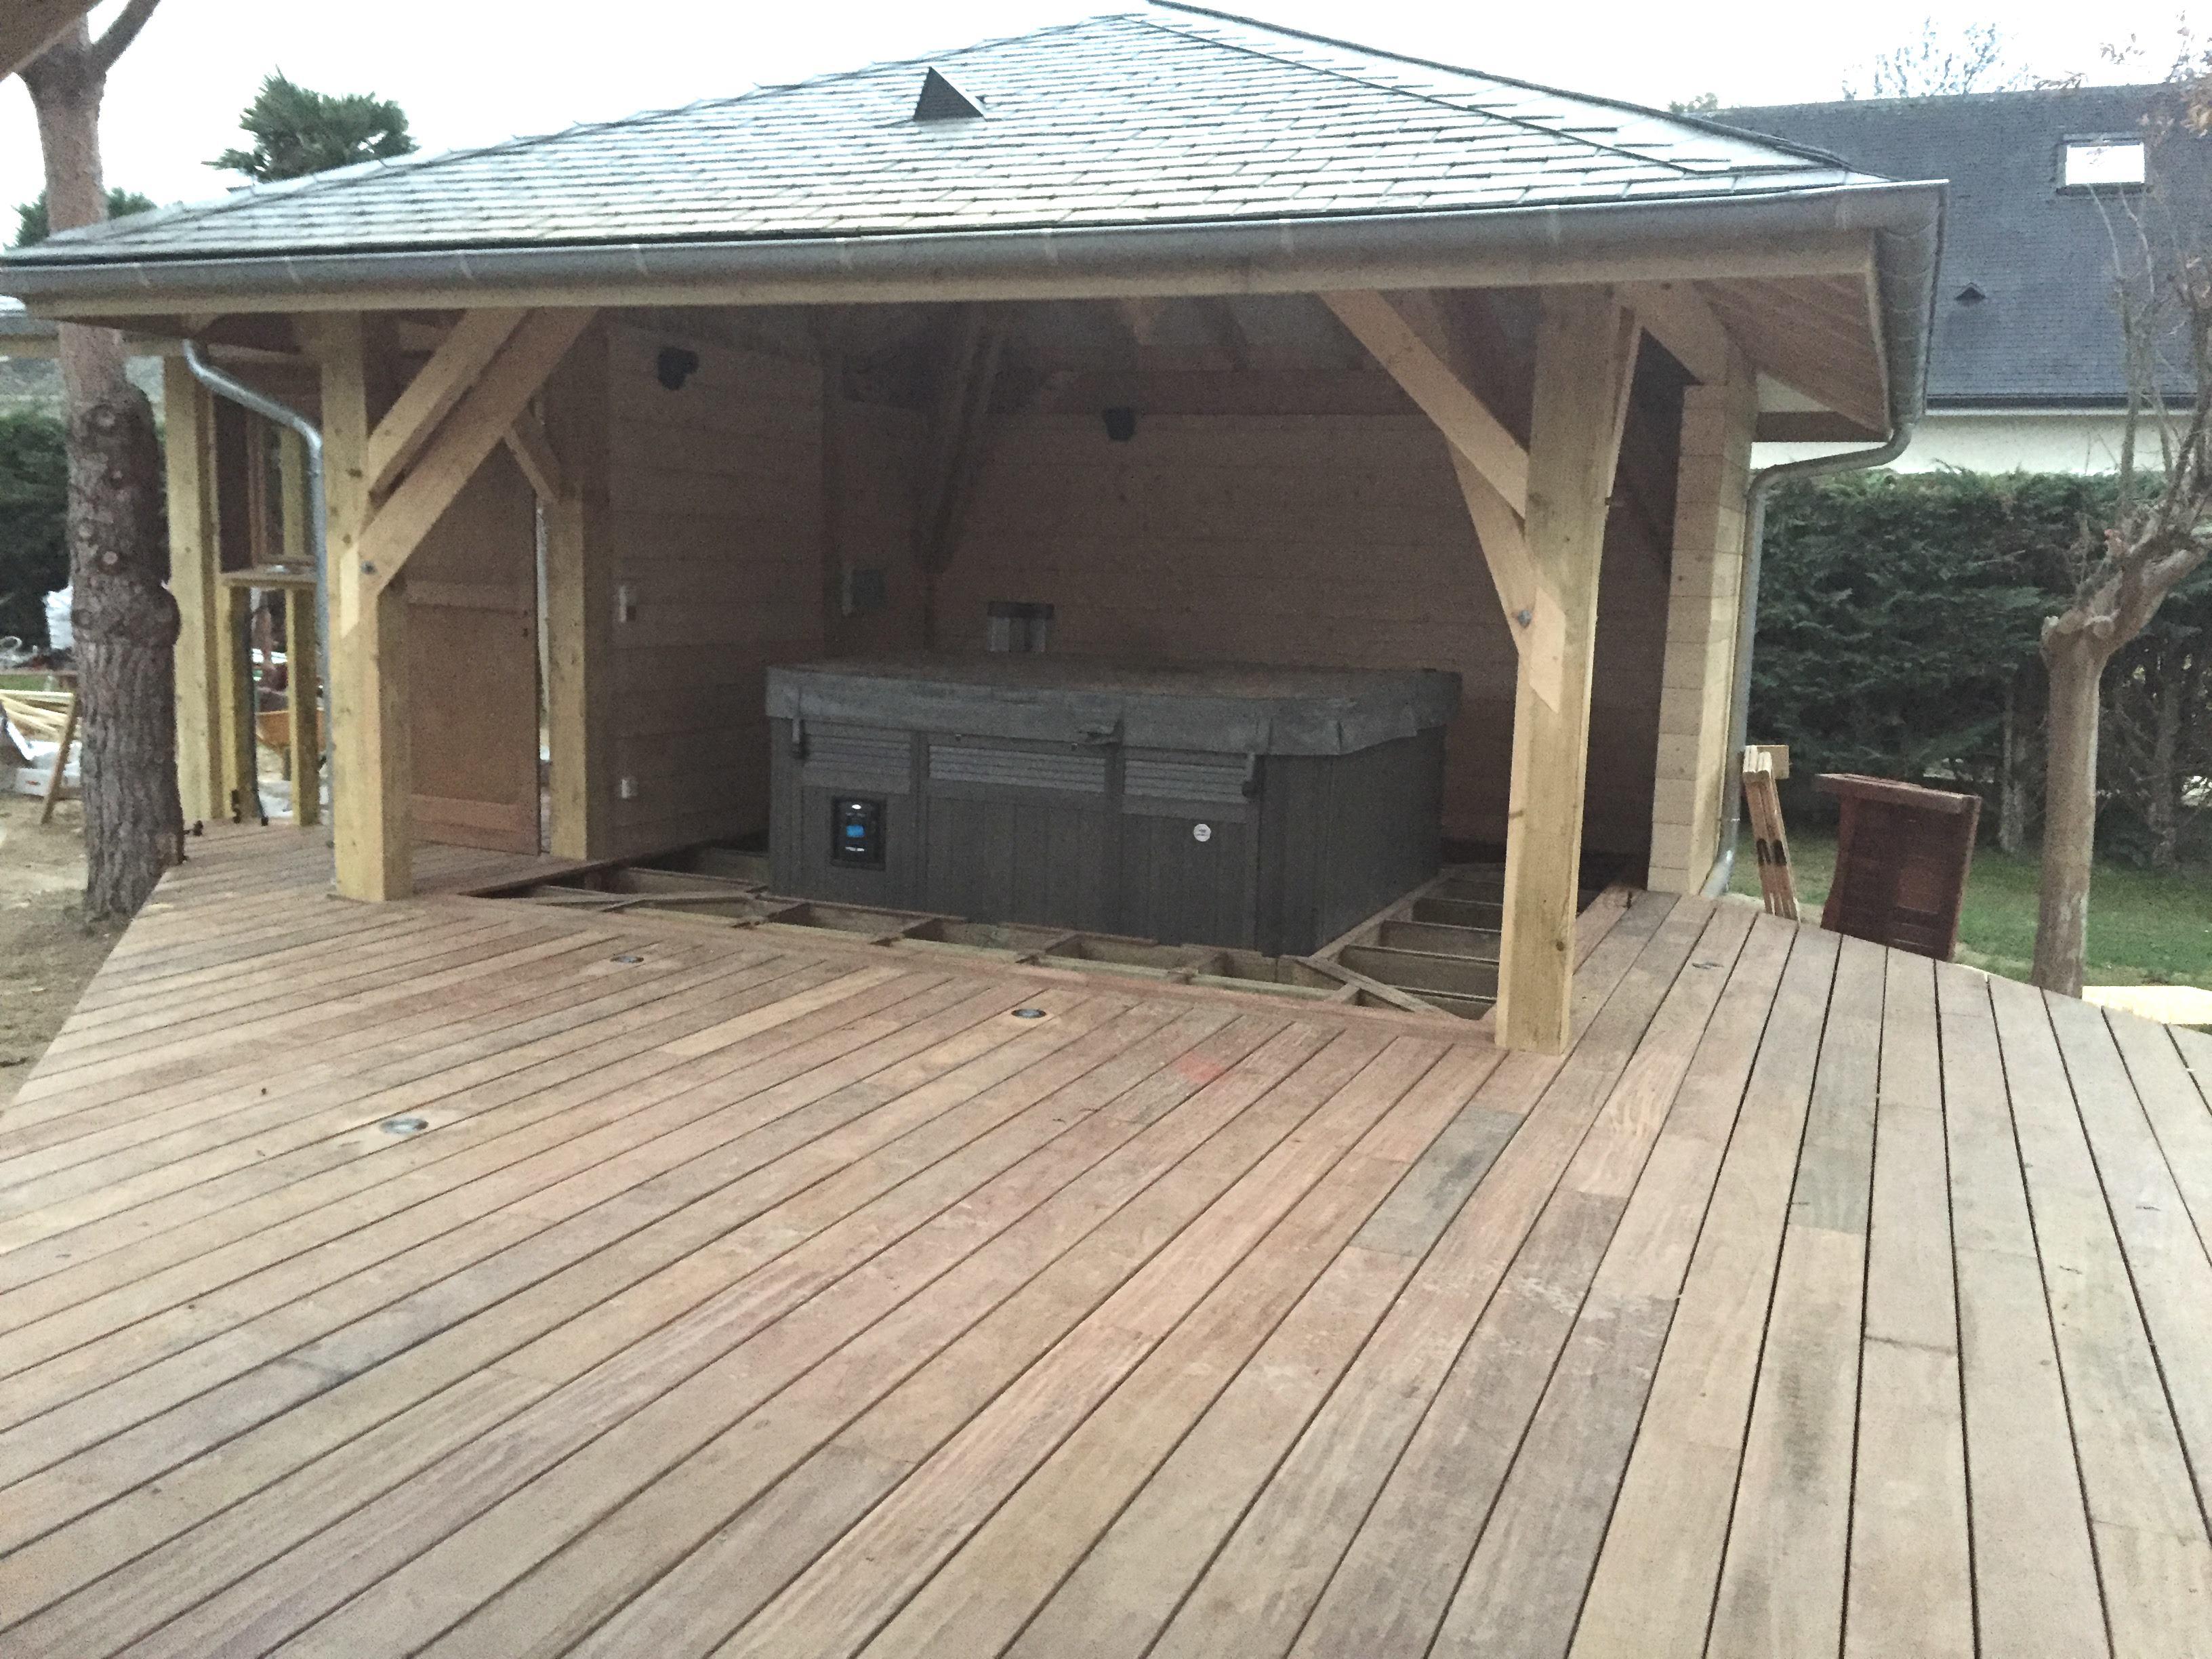 cr ations bois darrieumerlou terrasse bois cumaru. Black Bedroom Furniture Sets. Home Design Ideas